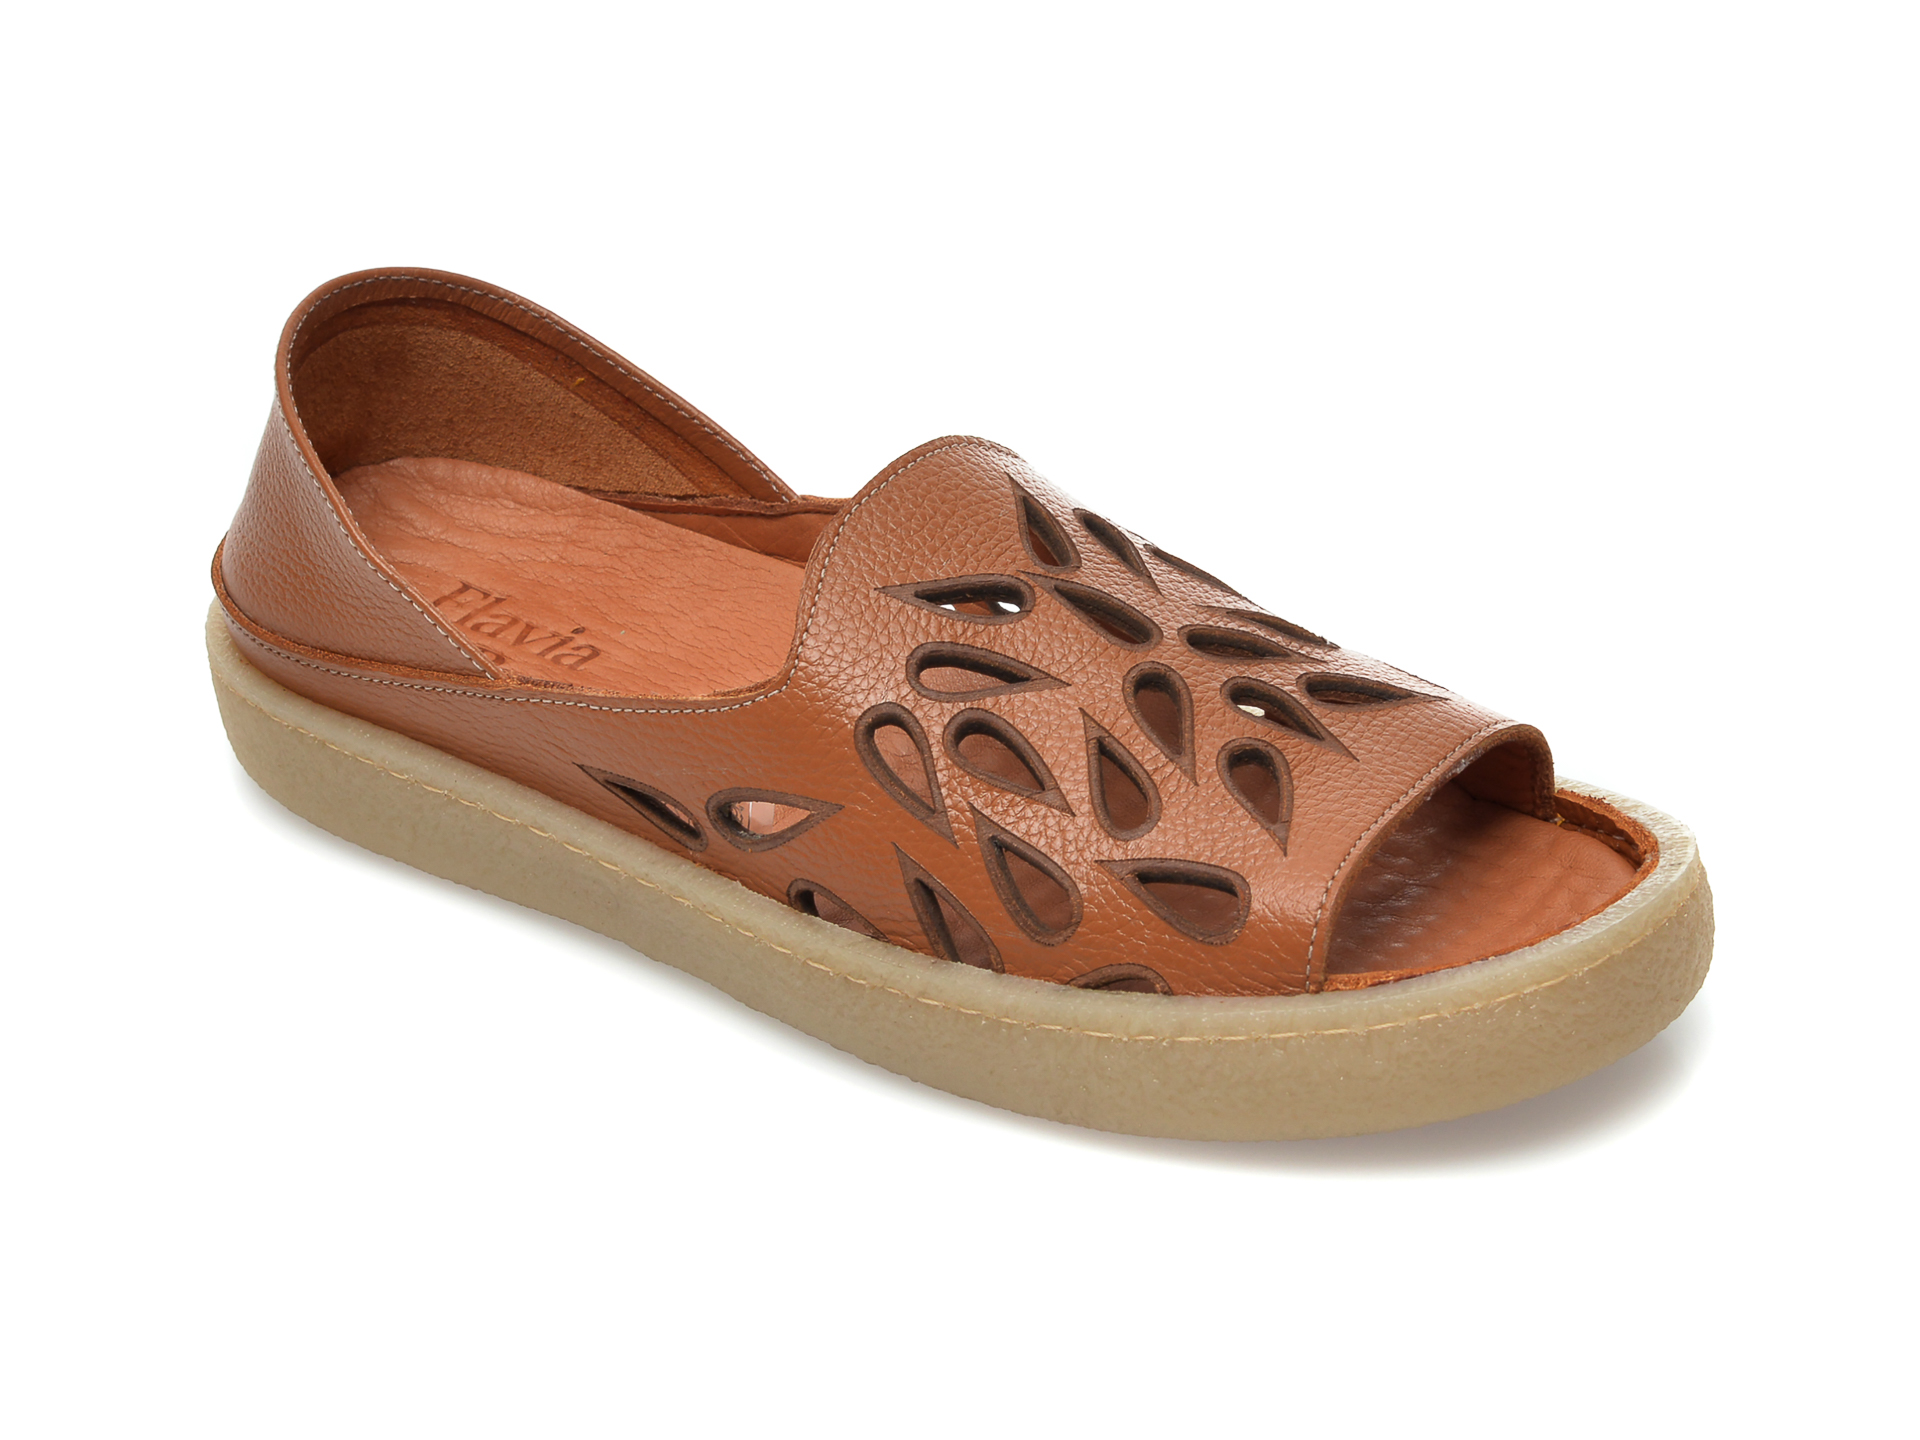 Sandale FLAVIA PASSINI maro, 20710, din piele naturala imagine otter.ro 2021